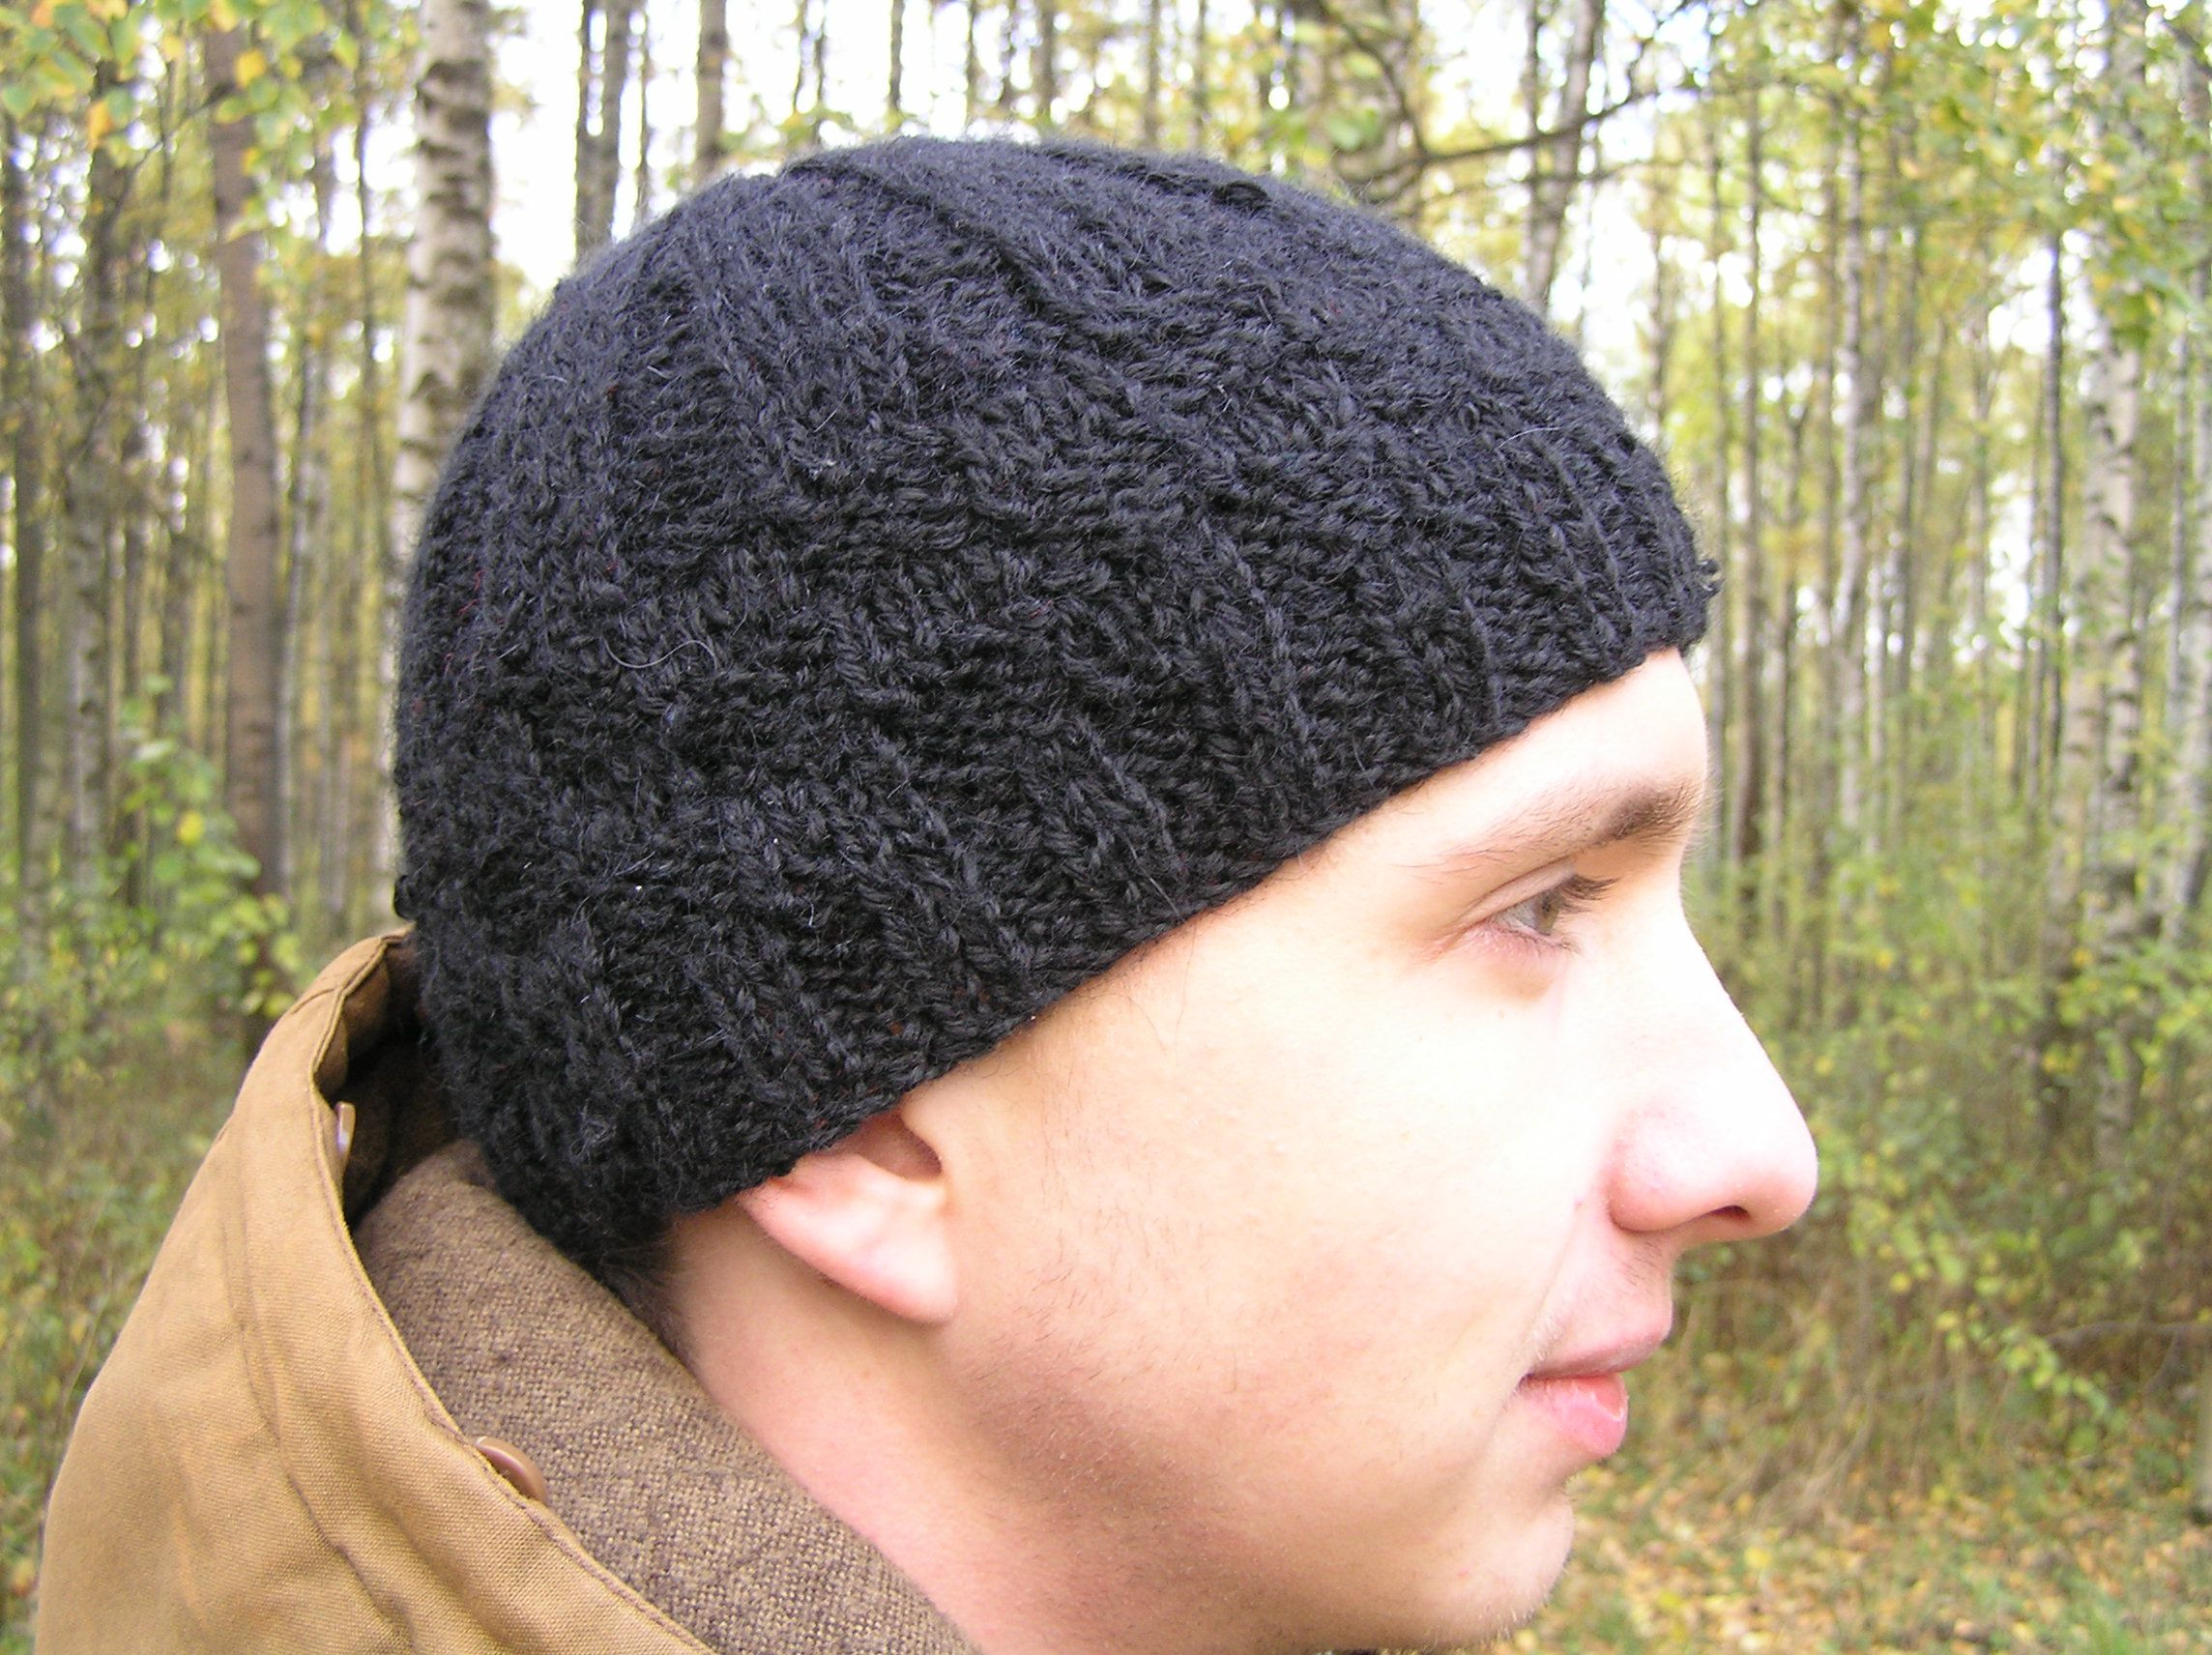 шапкаженская шапкамужская шапкавязаная шапказимняя шапка черный серый